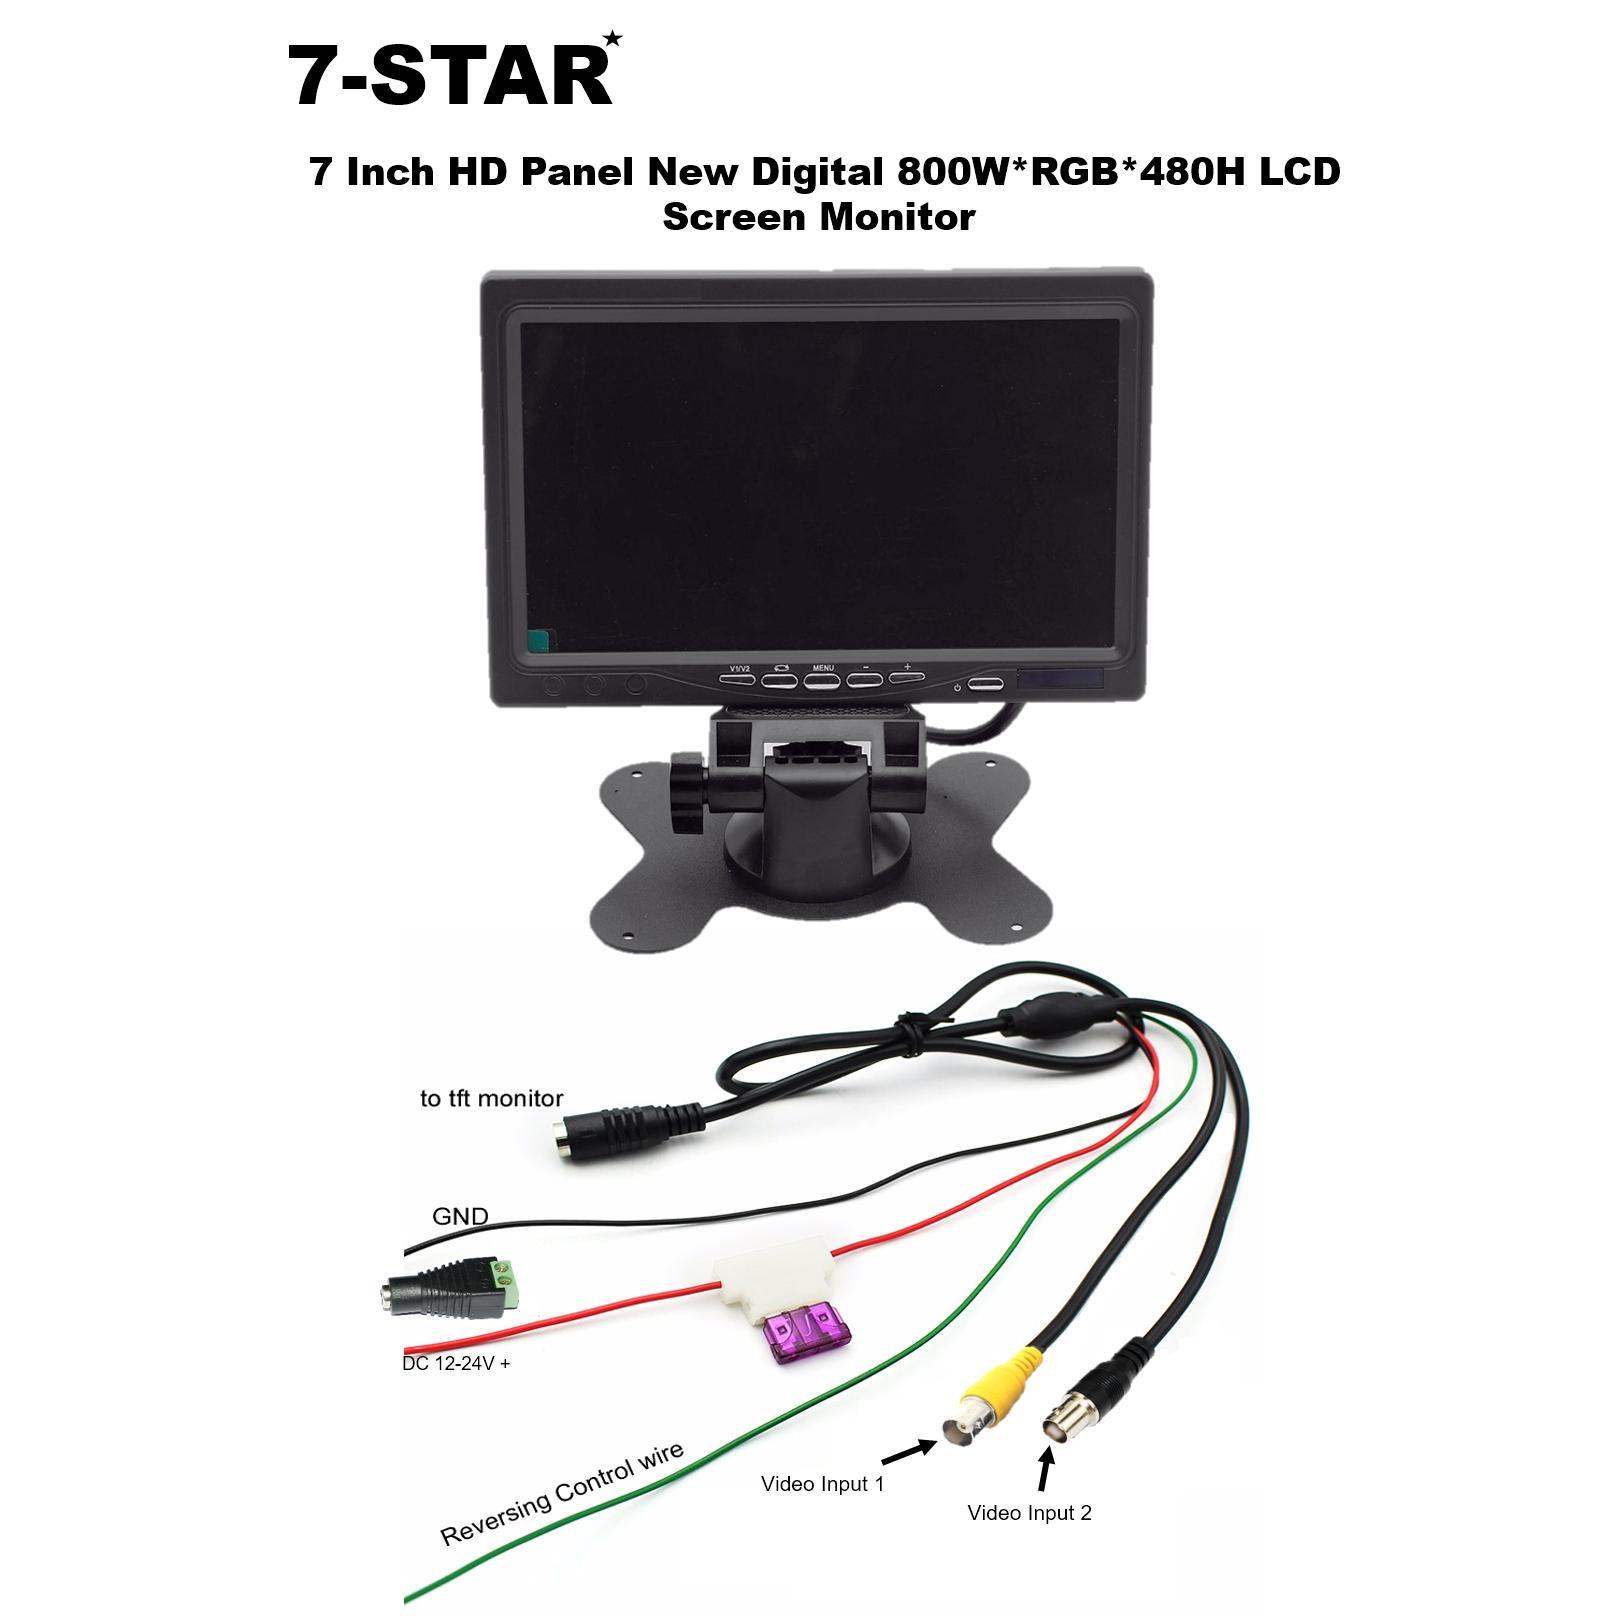 LCD TV Singapore | Smart LCD TV - Lazada.sg